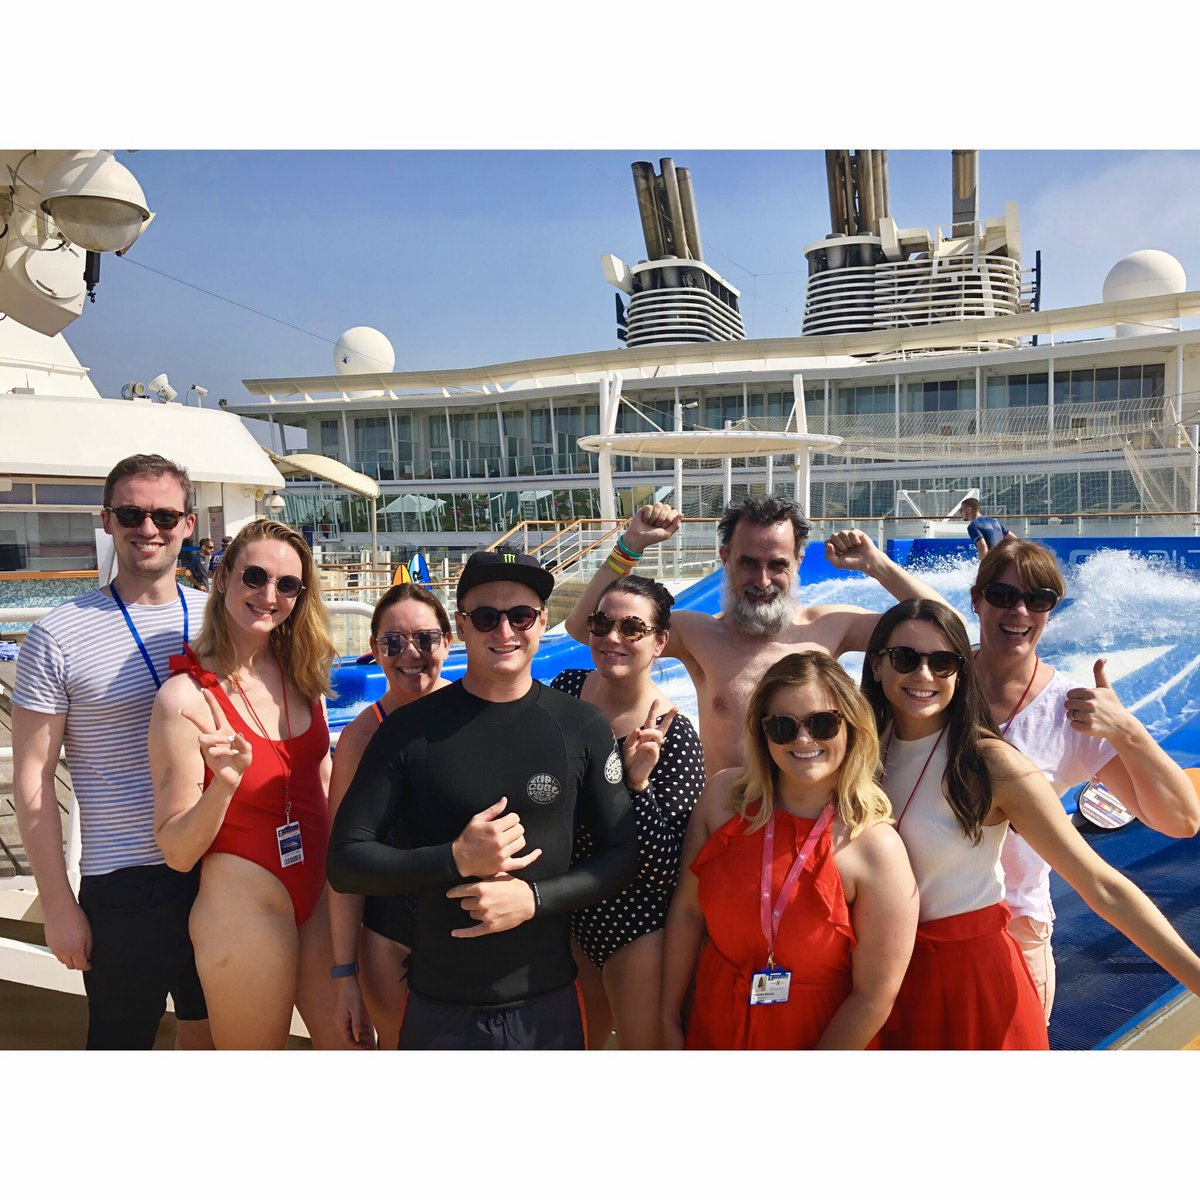 We had a fantastic weekend filming onboard #OasisoftheSeas in Barcelona with @MyRoyalUK for #SurfsUp 🛳🏄🏻♀️ a surf masterclass with a difference @jimmurty @irishdailystar @ornacunningham @IrishSunOnline @irishdailymail @Lindamaherdub @EVOKE @corinagaffey @speedmotionfilm https://t.co/18xDoMV4KL